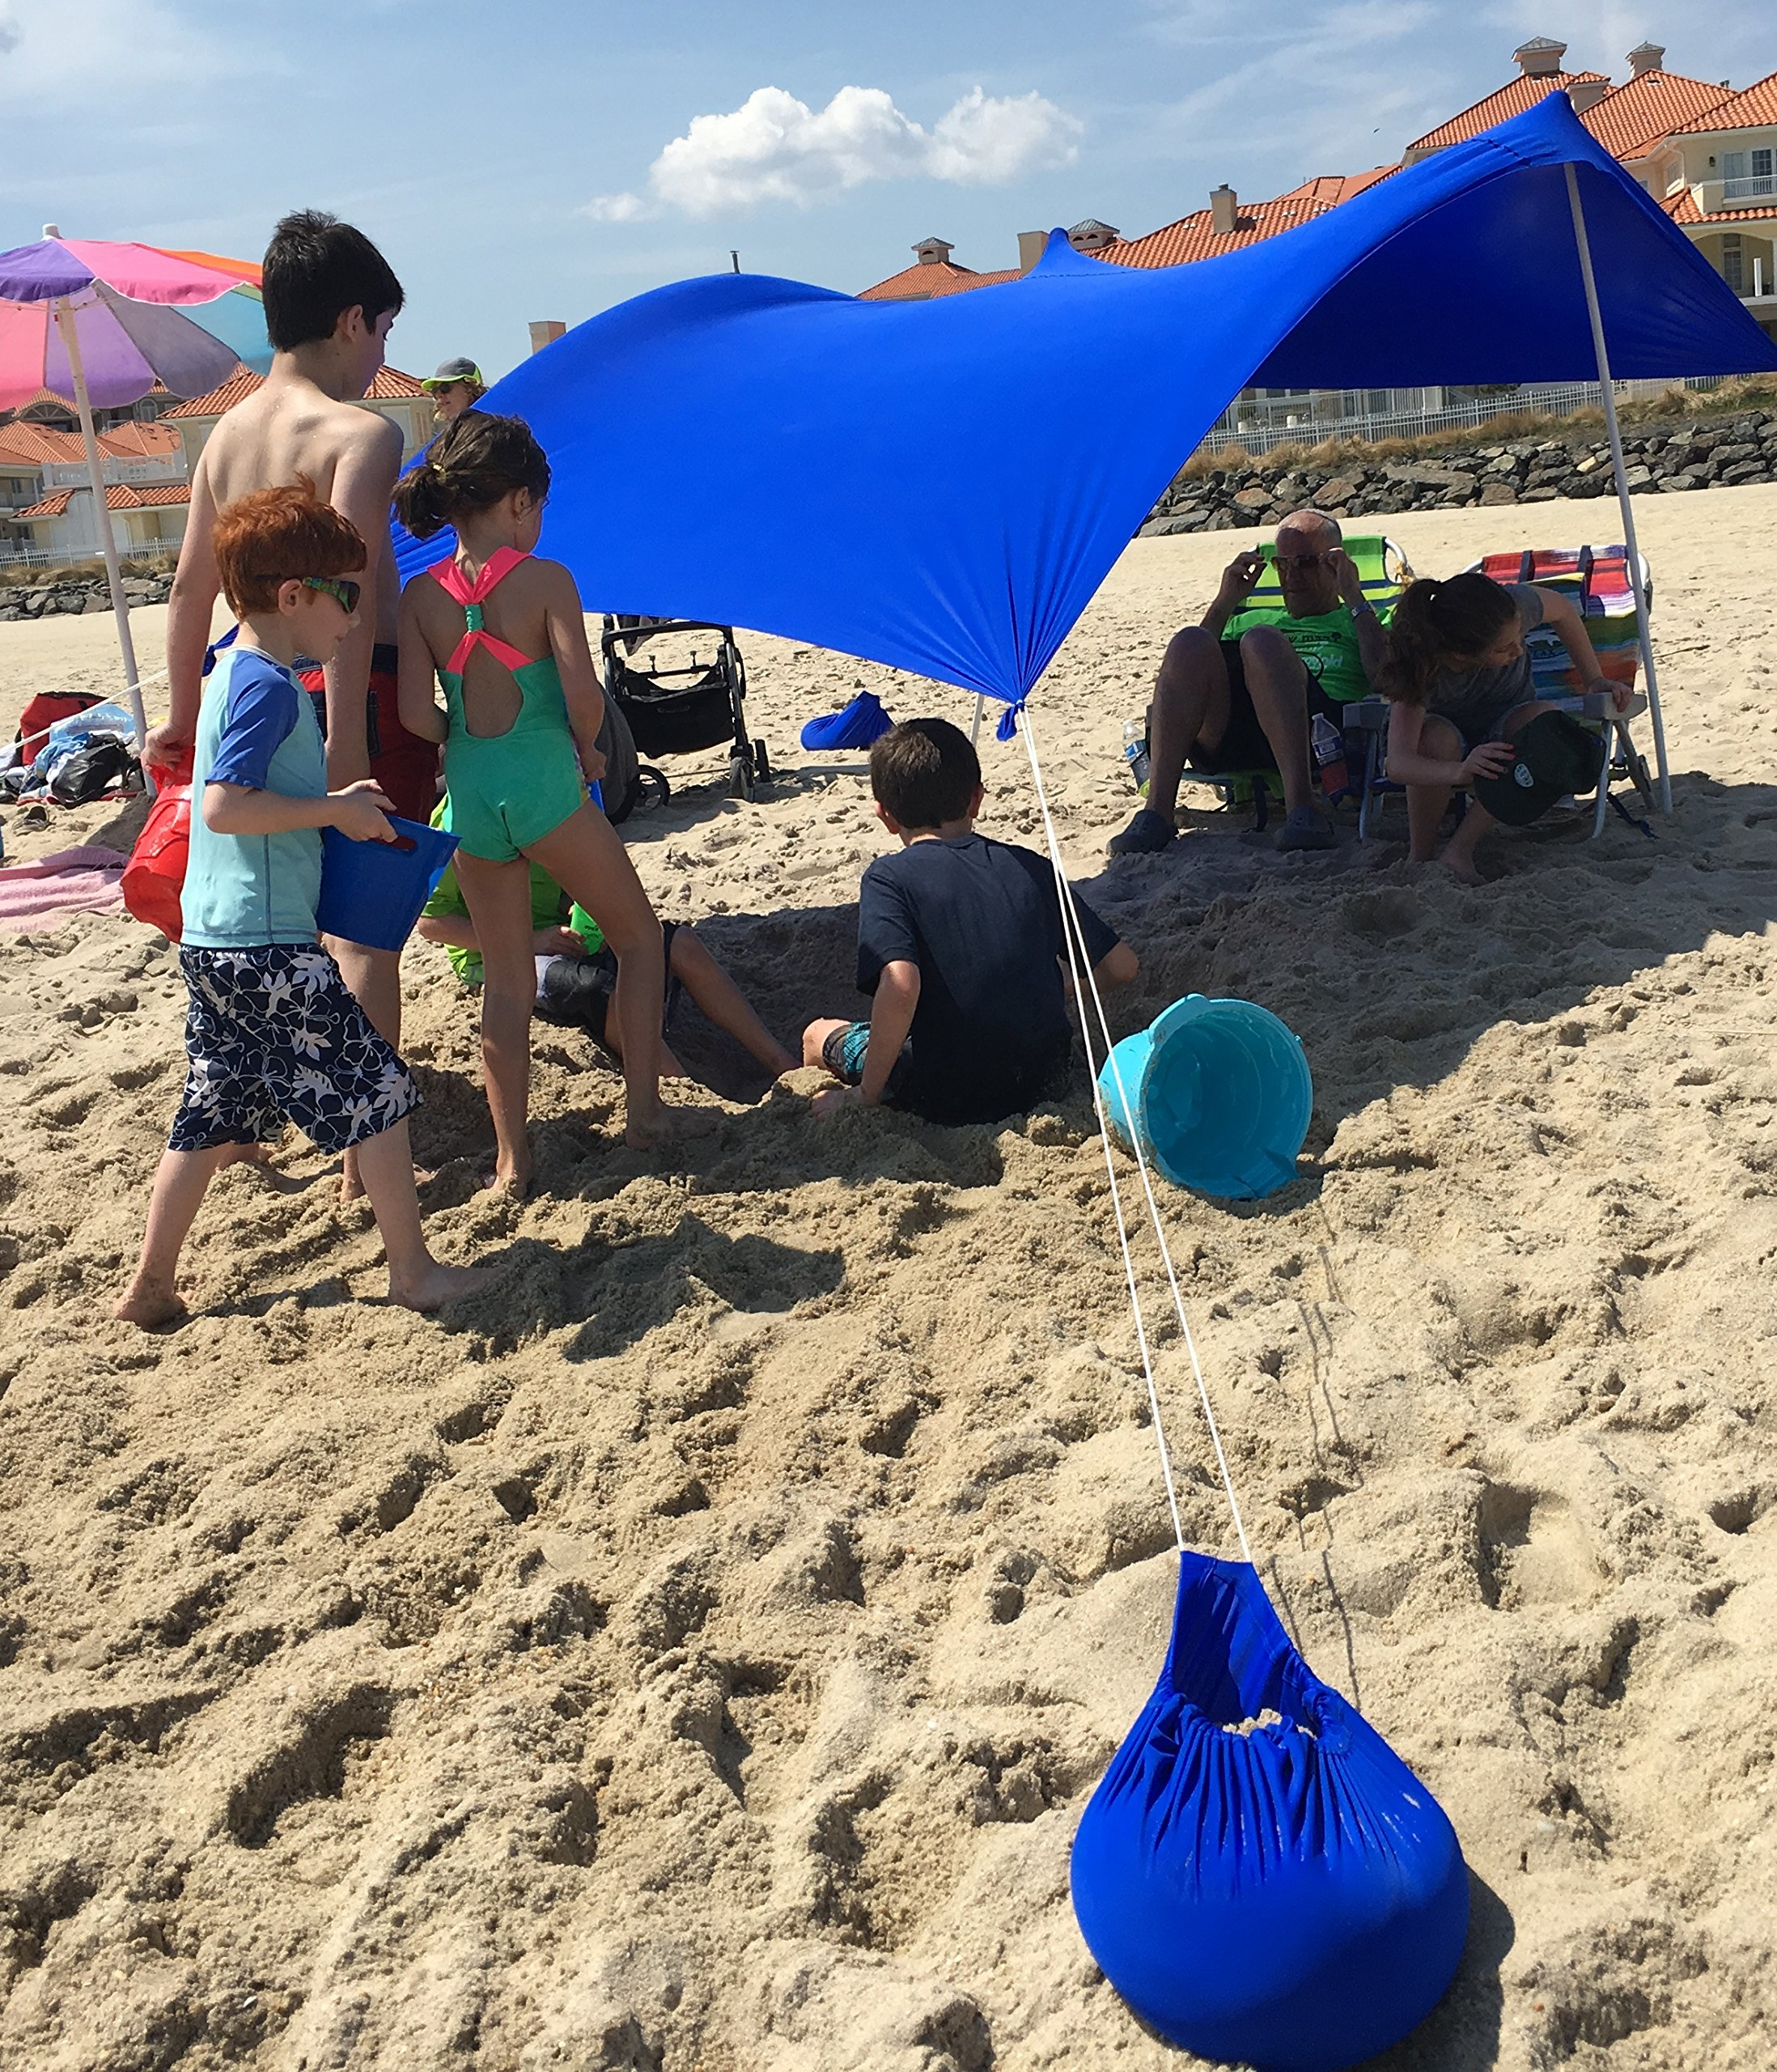 UV Light Sun shade Protection Beach Shelters - Lightweight Tent Canopy with Sandbag Anchors